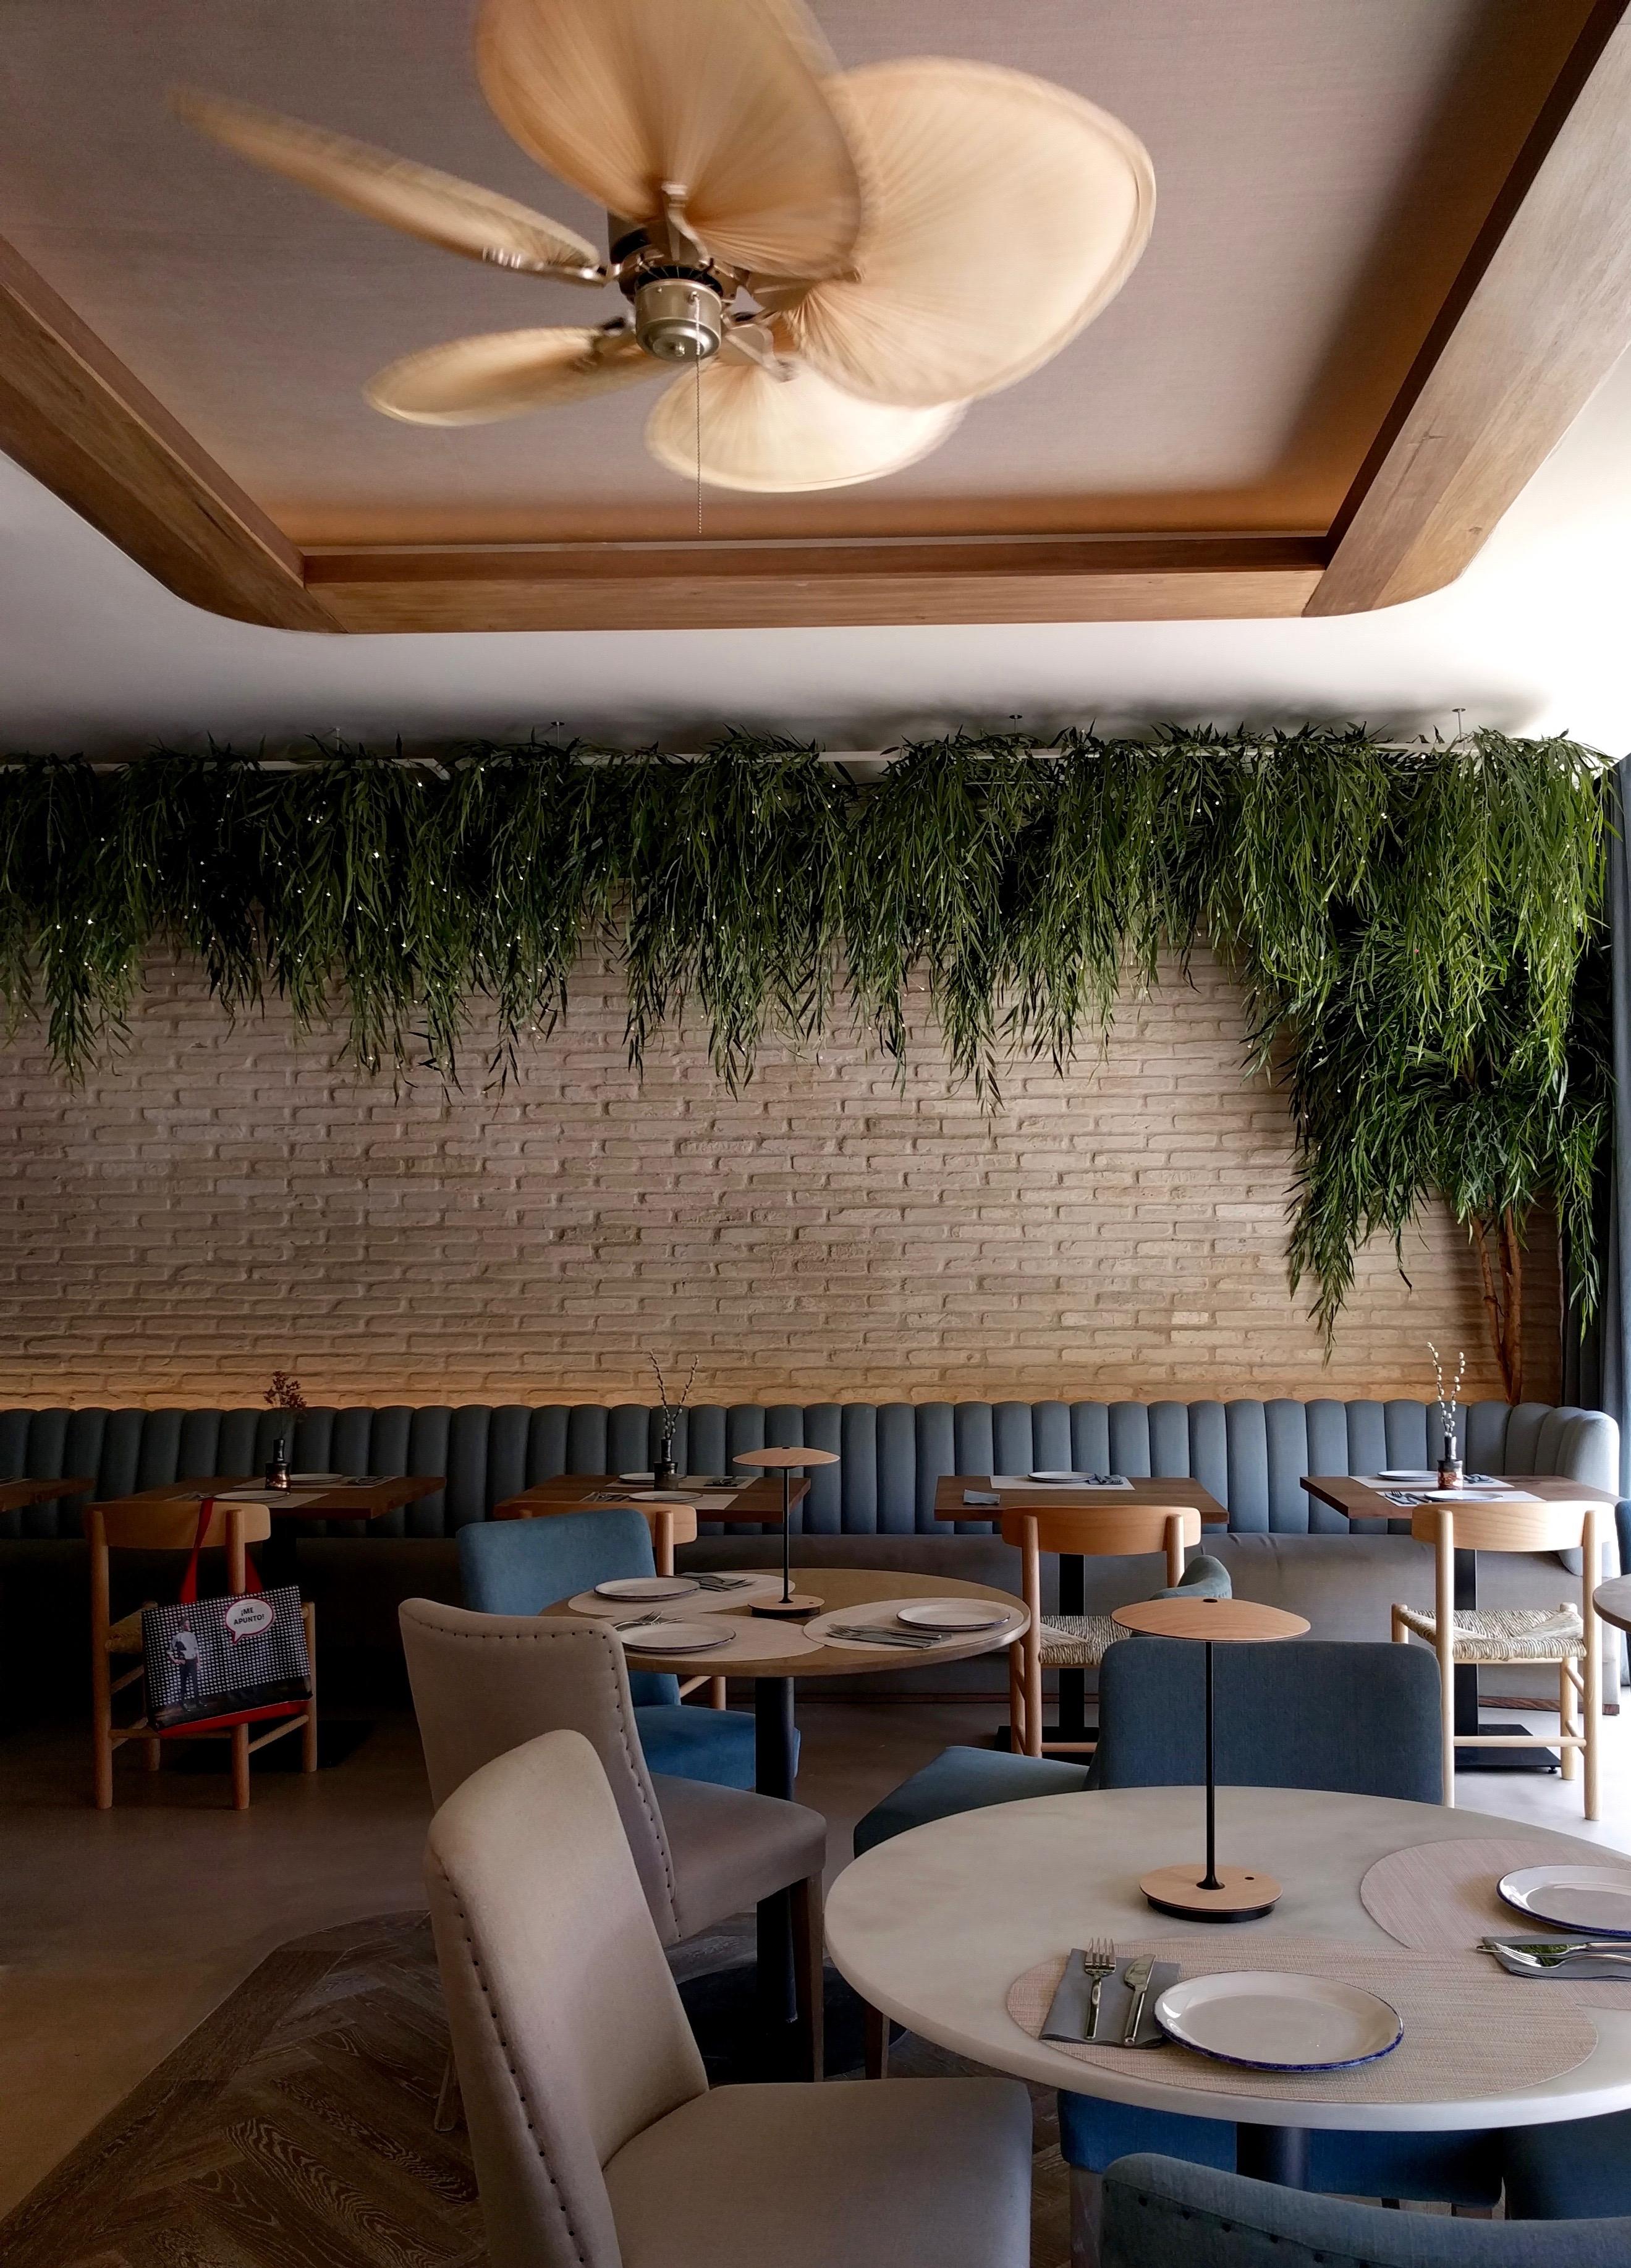 Tagomago nuevo restaurante del grupo saona ojo al plato - Tagomago restaurante valencia ...